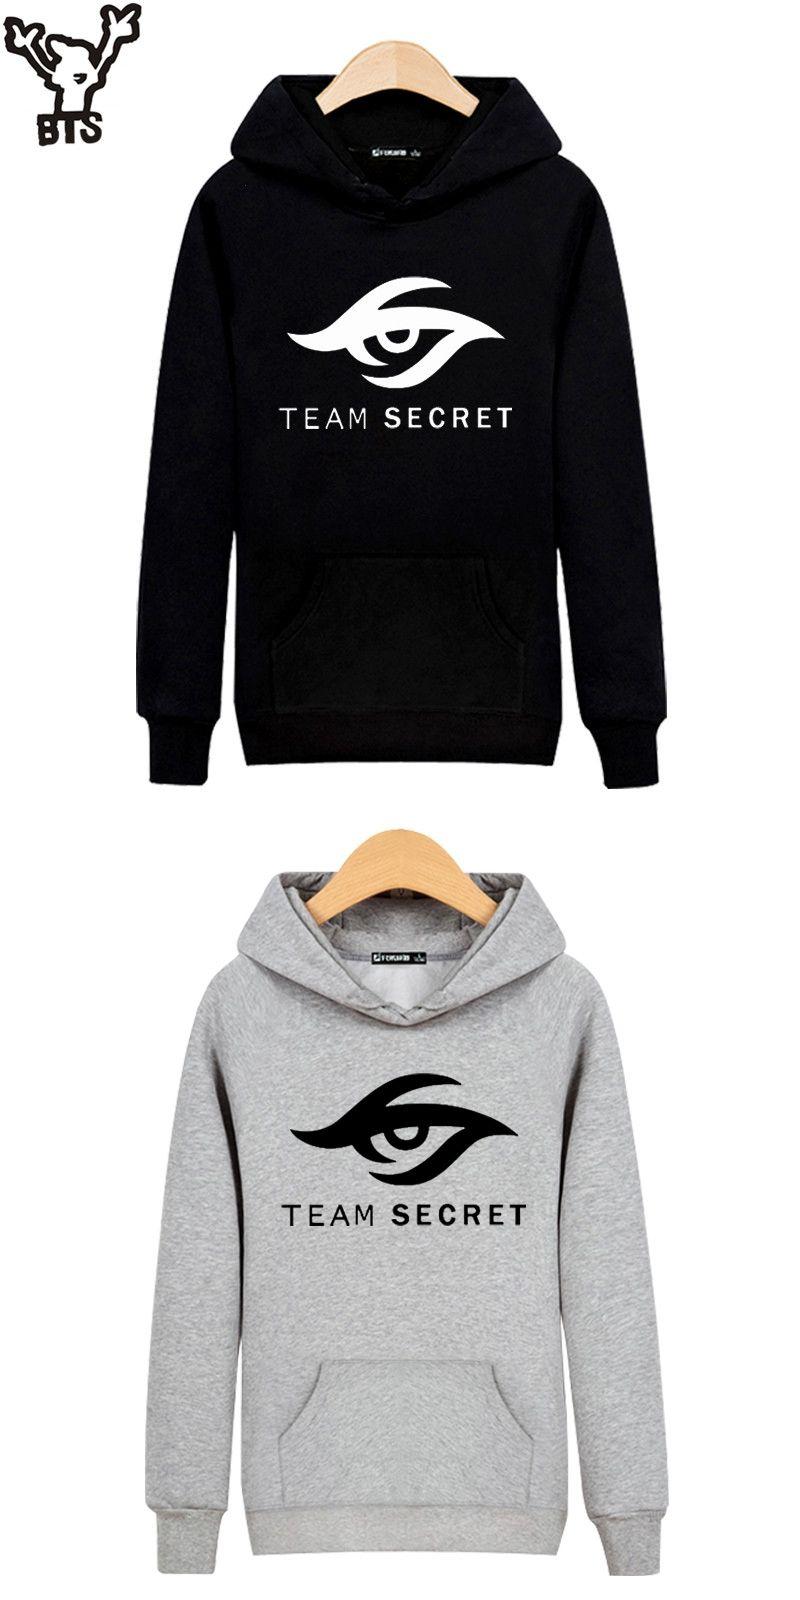 4de6dd661774 BTS Dota 2 TEAM SECRET Hooded Sweatshirt Men Hoodie Champion Team Fashion  Winter Hoodies Men Casual